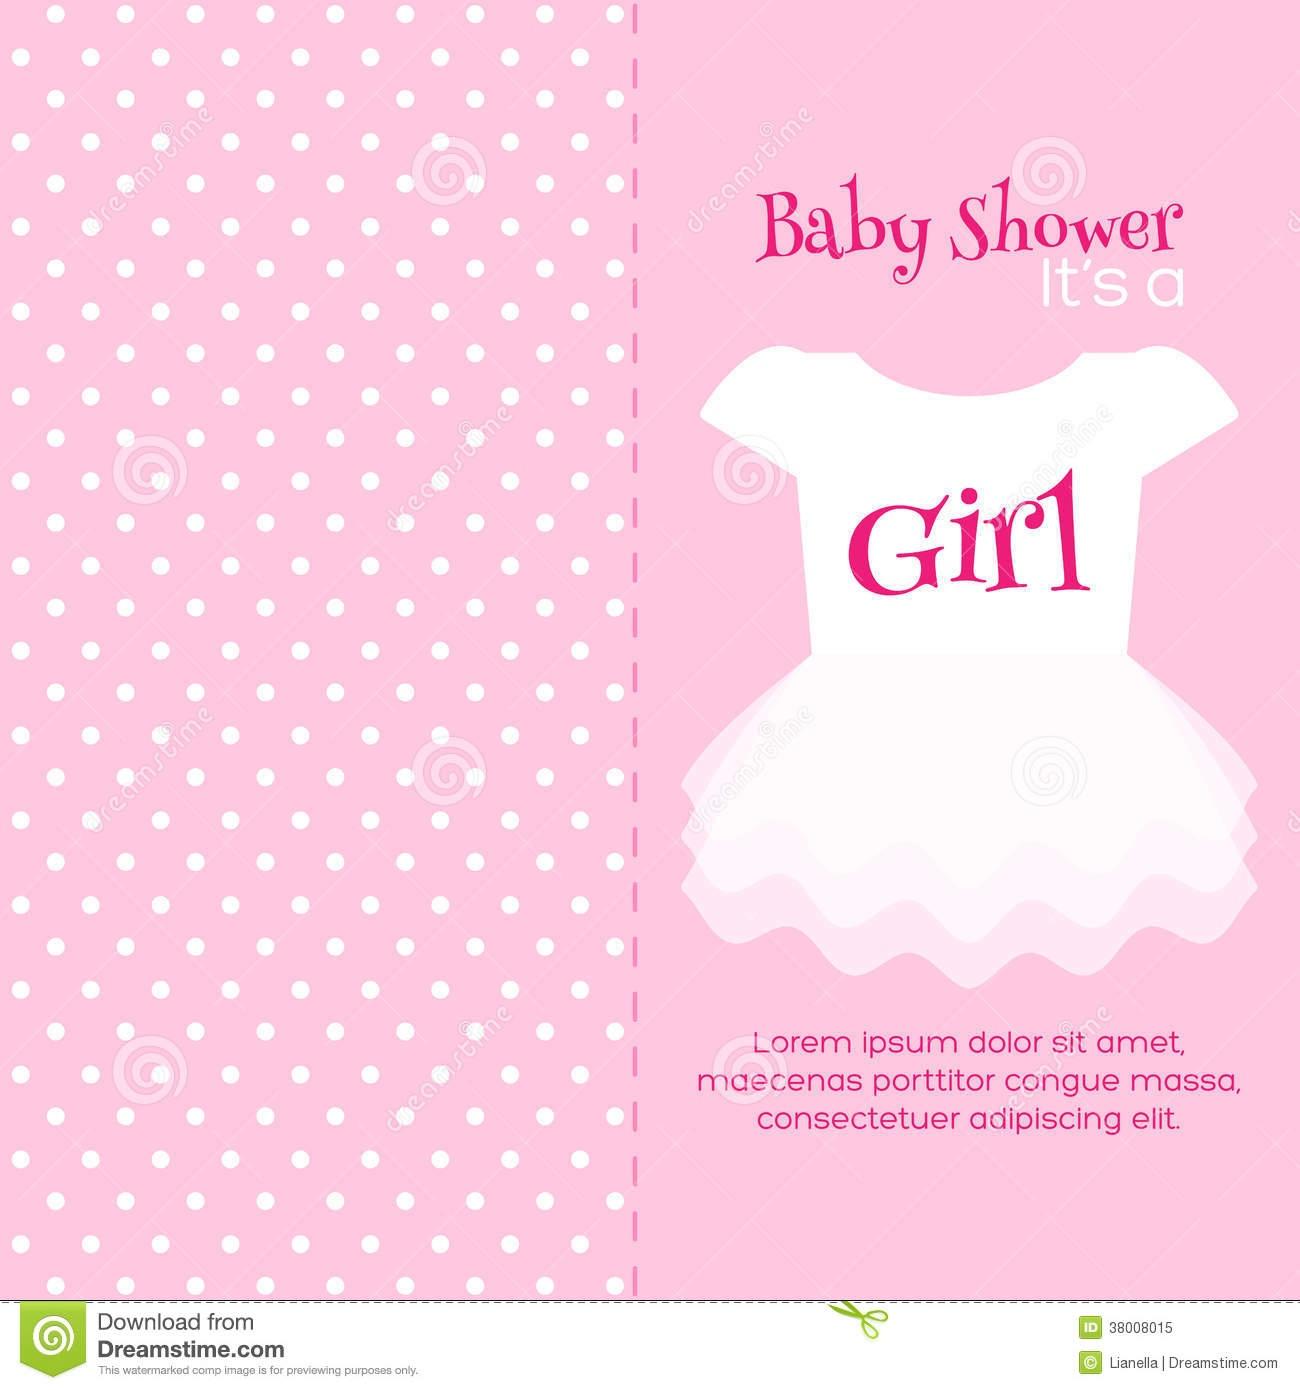 Download Baby Shower Invitation - Tutlin.psstech.co - Free Printable Blank Baby Shower Invitations